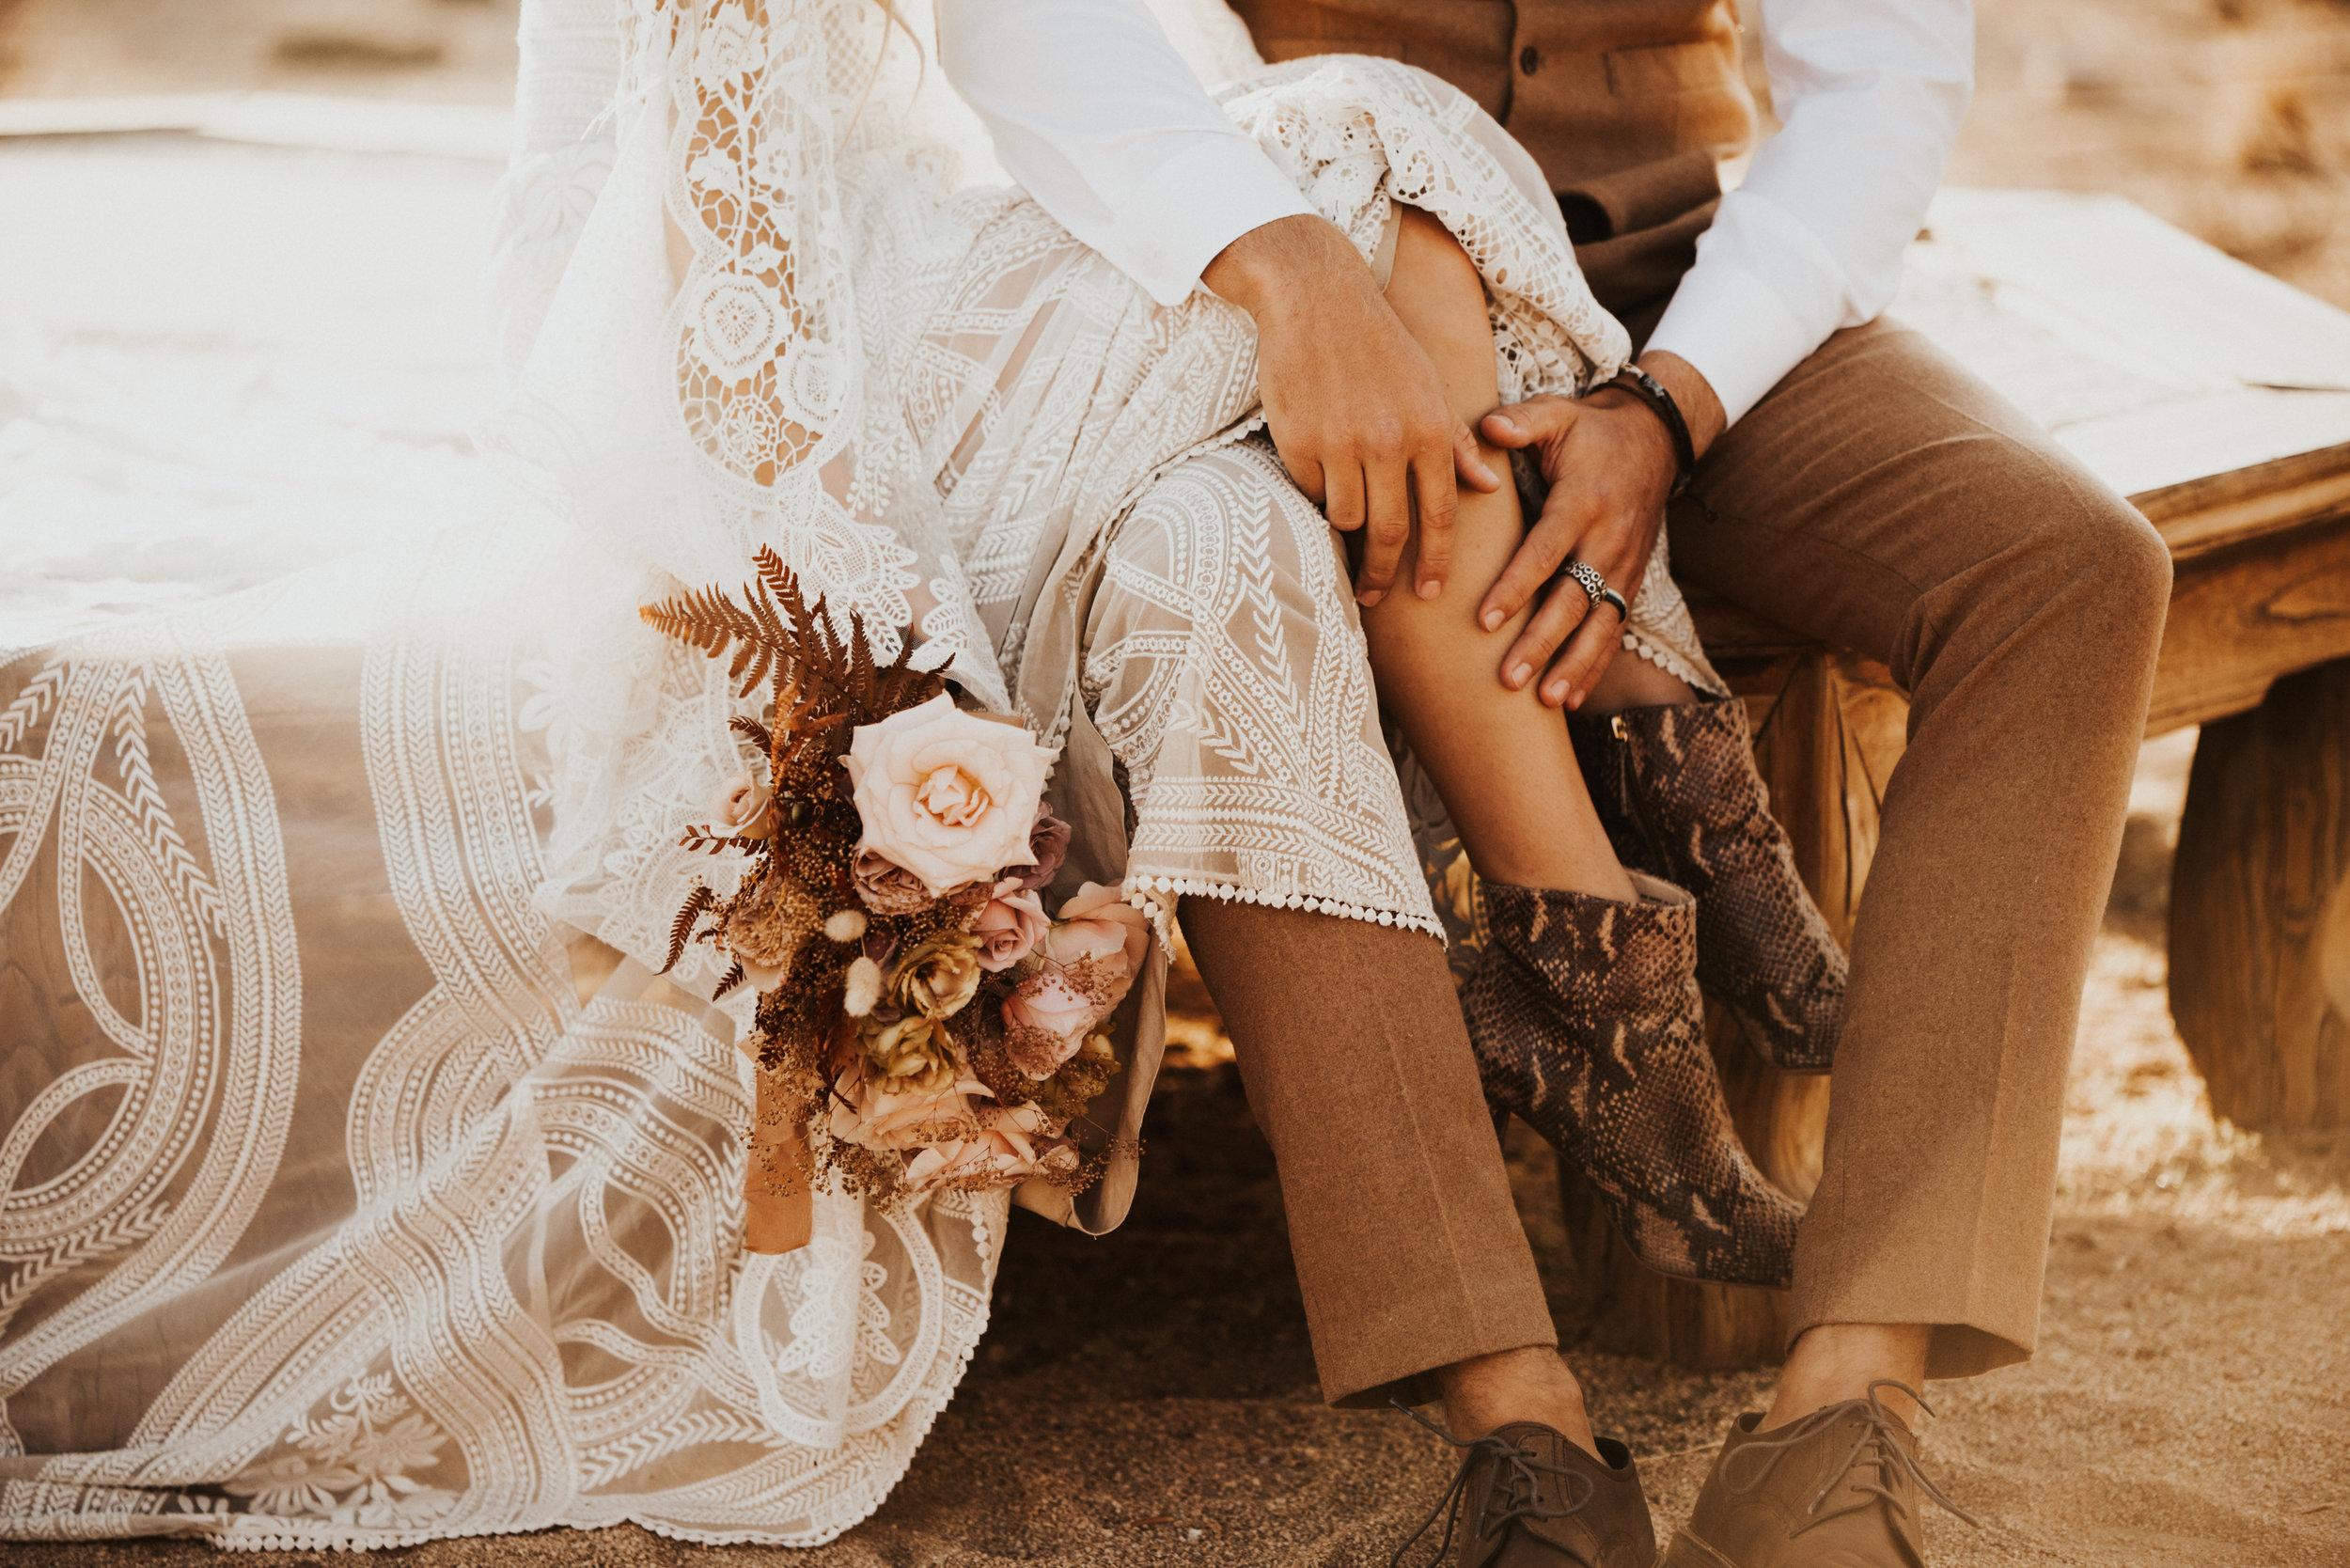 FortSt.John_photographer_TyraEPhotography_Wedding_Couple_Family_Photograhy_DawsonCreek_Elopement_Bride_Boduoir_Portraits-5387.jpg